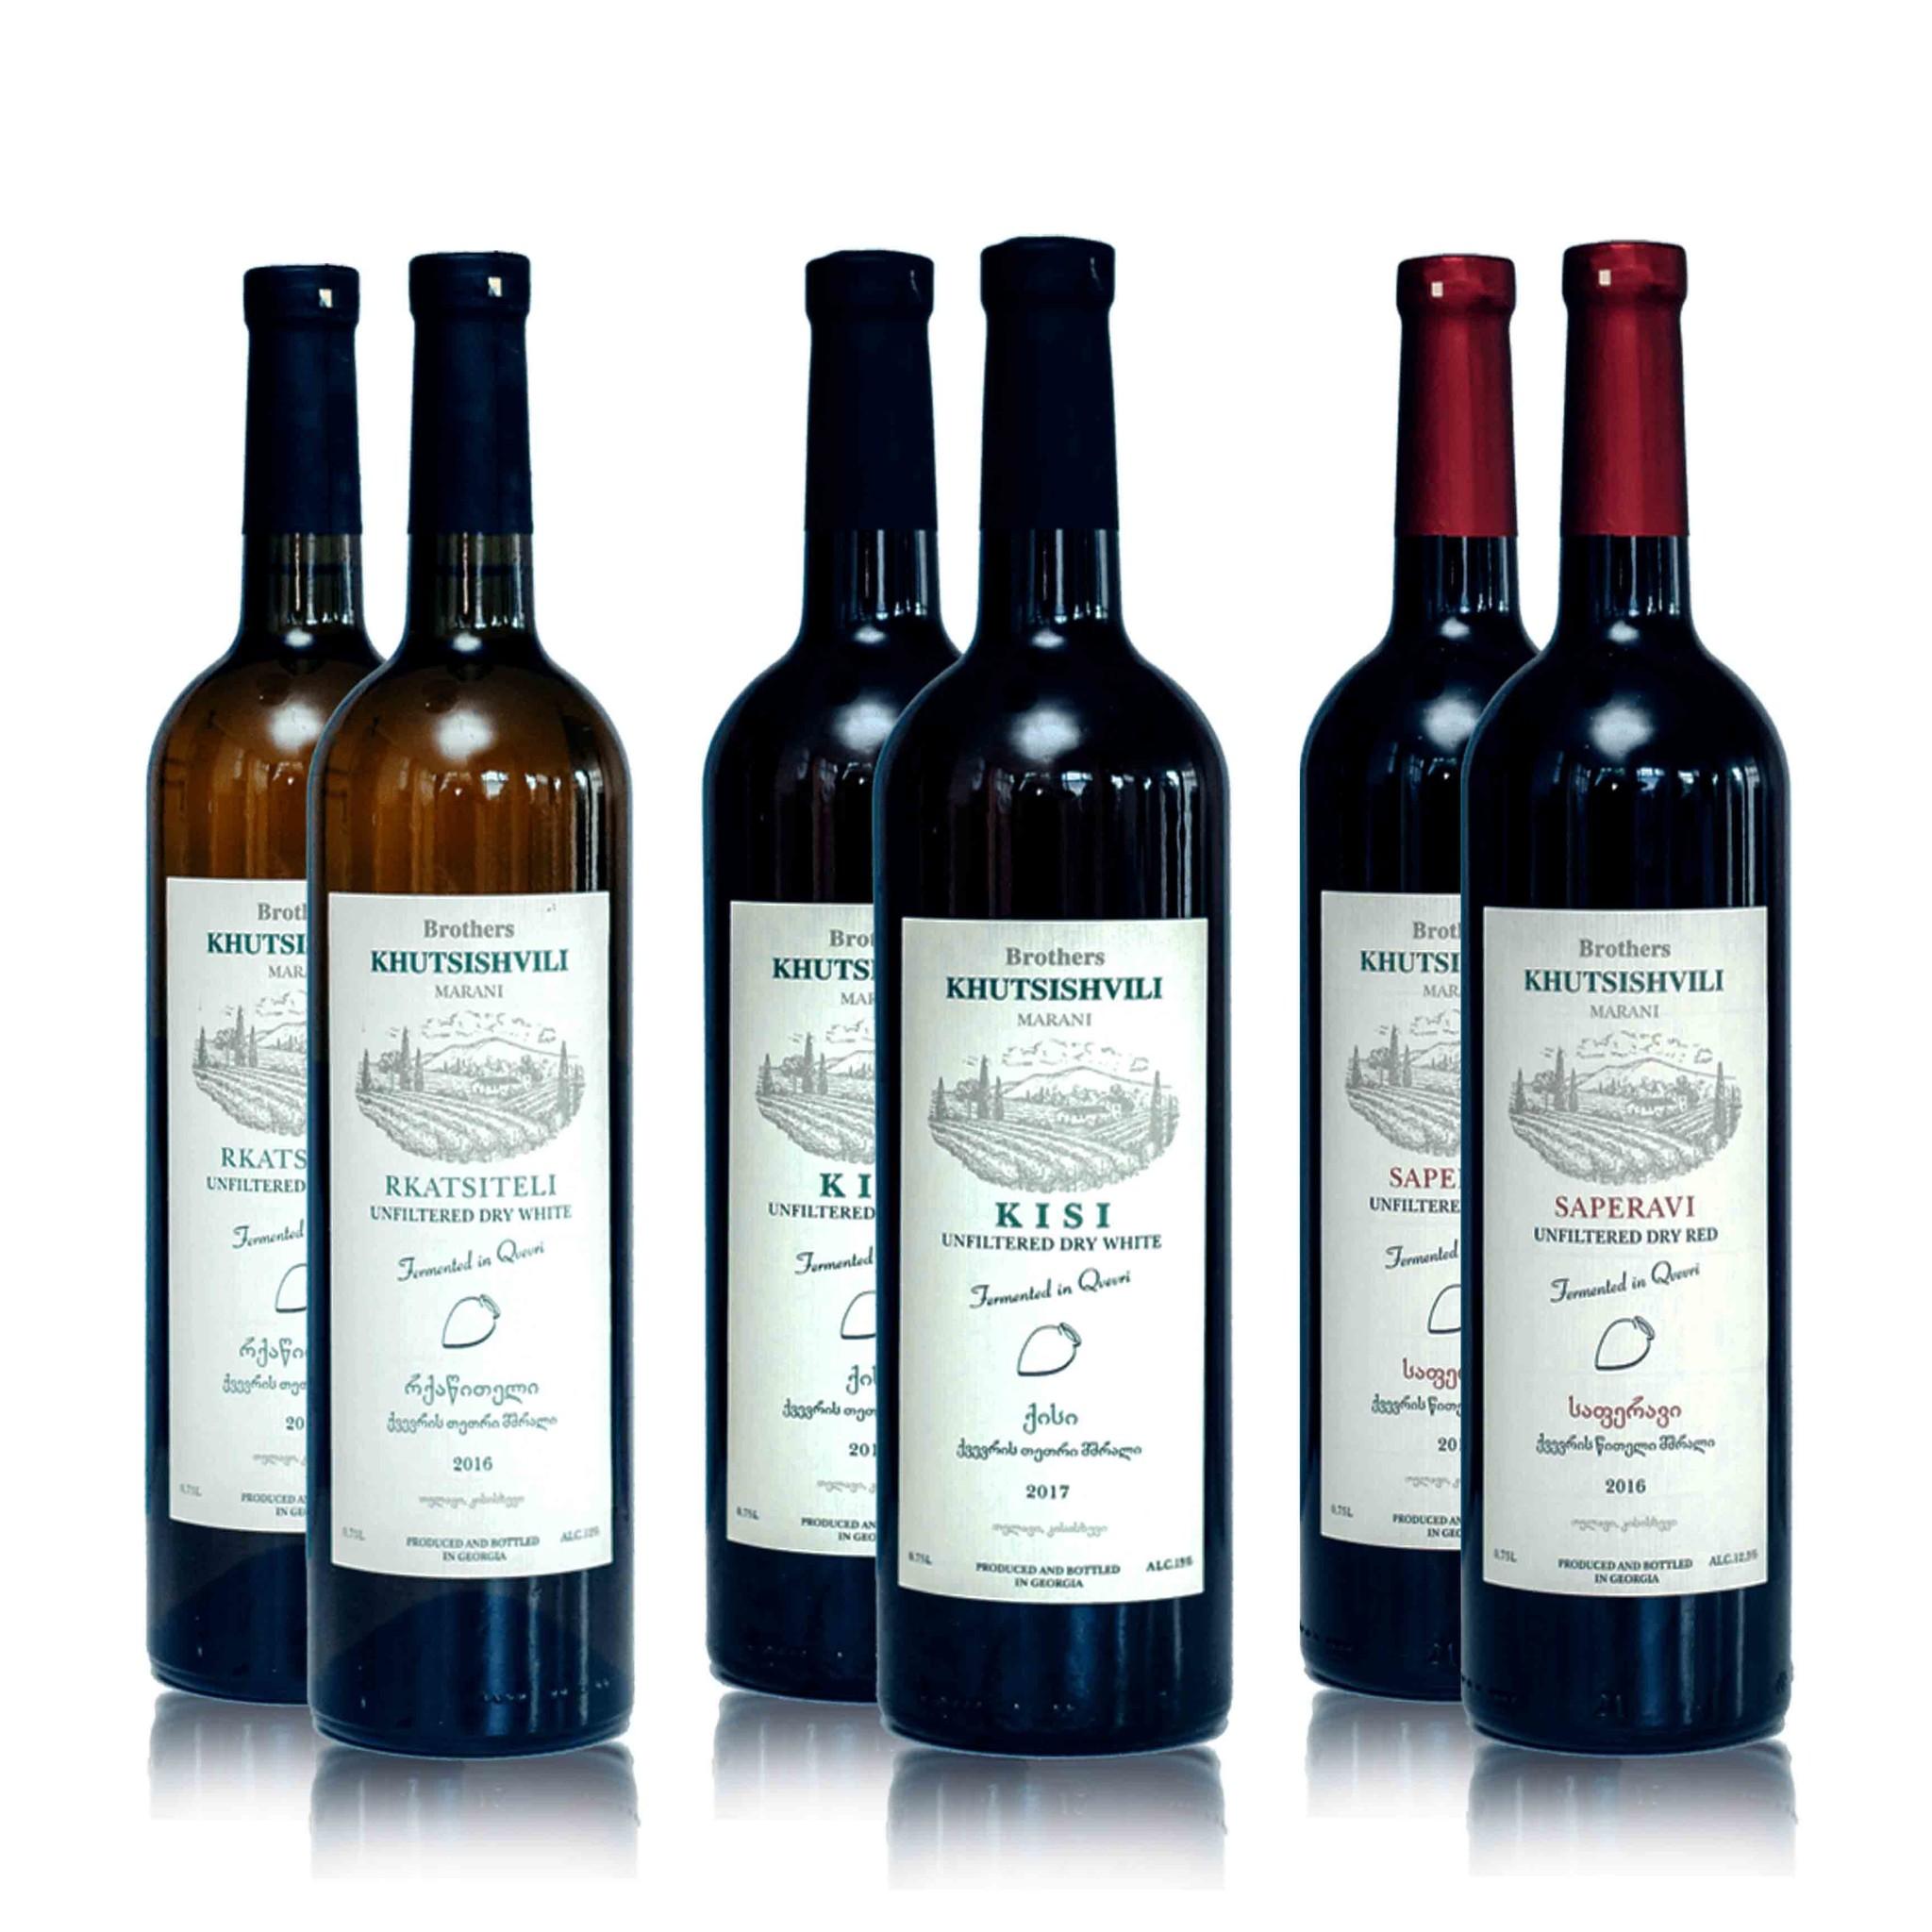 Khutsishvilli wine tasting package [6x]